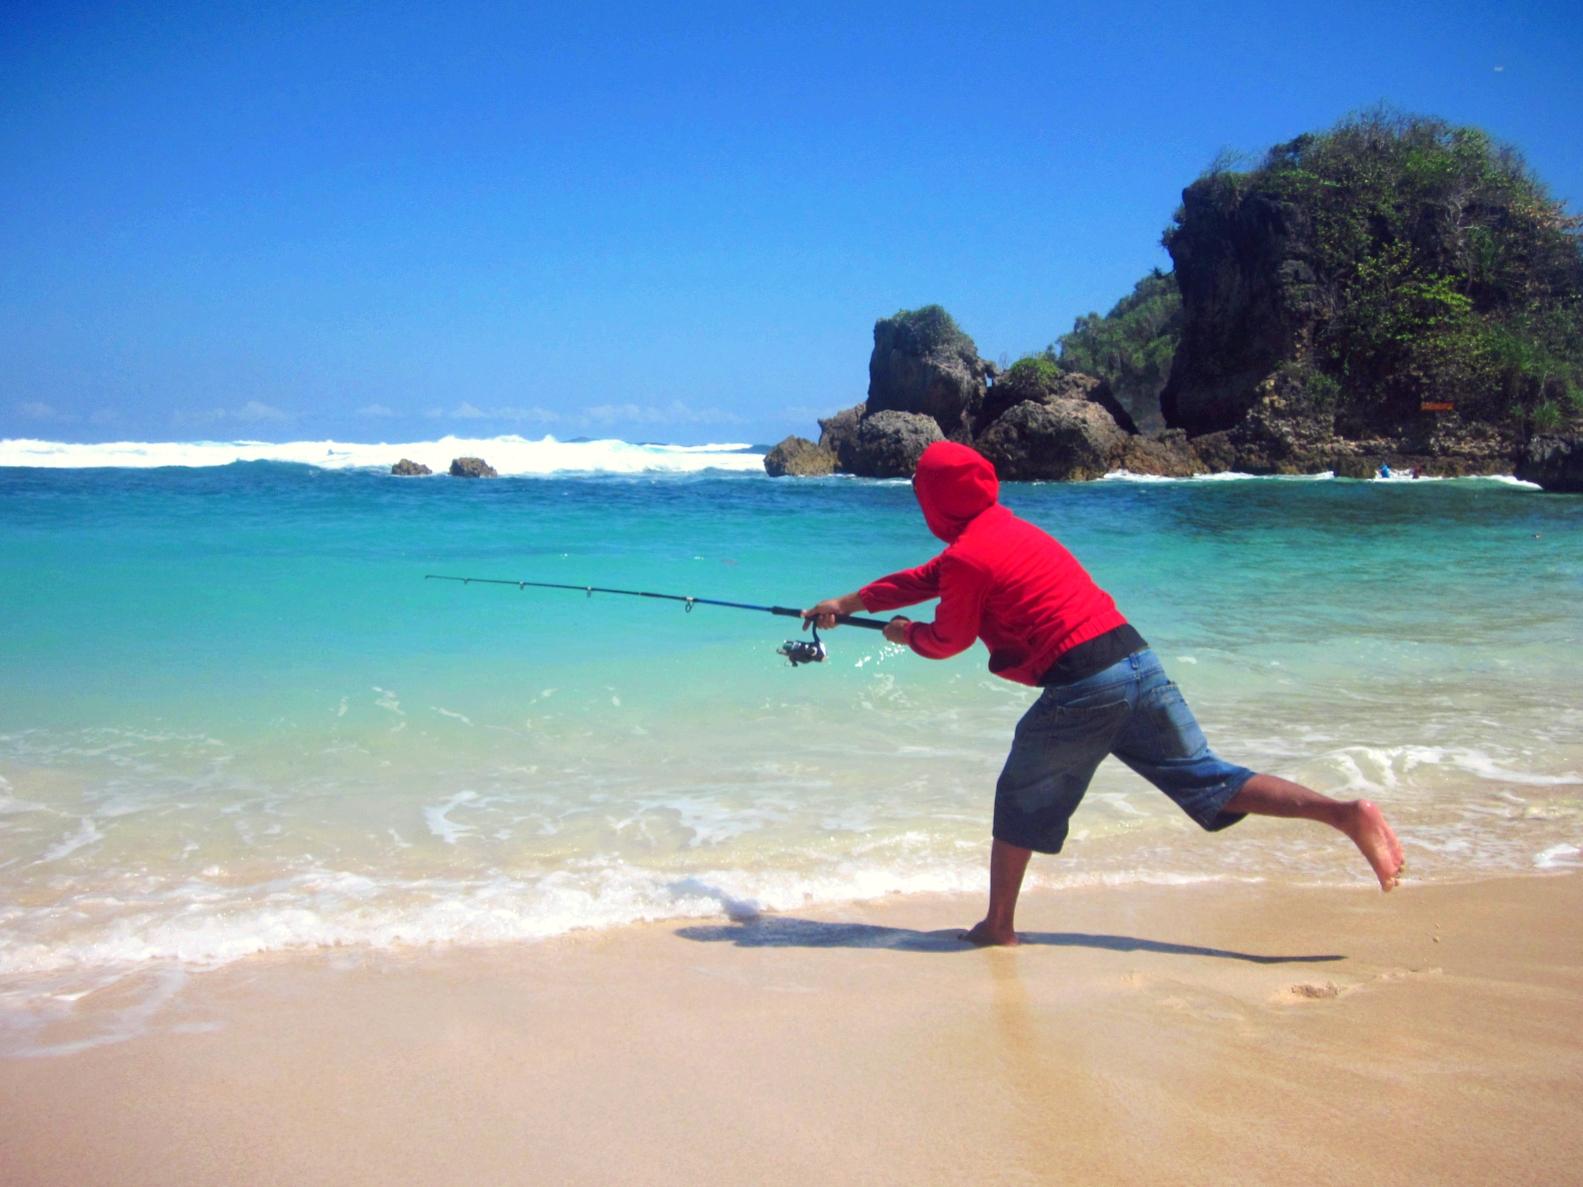 Pantai Malang Raya Whiempy Referensi Kaliapus Kab